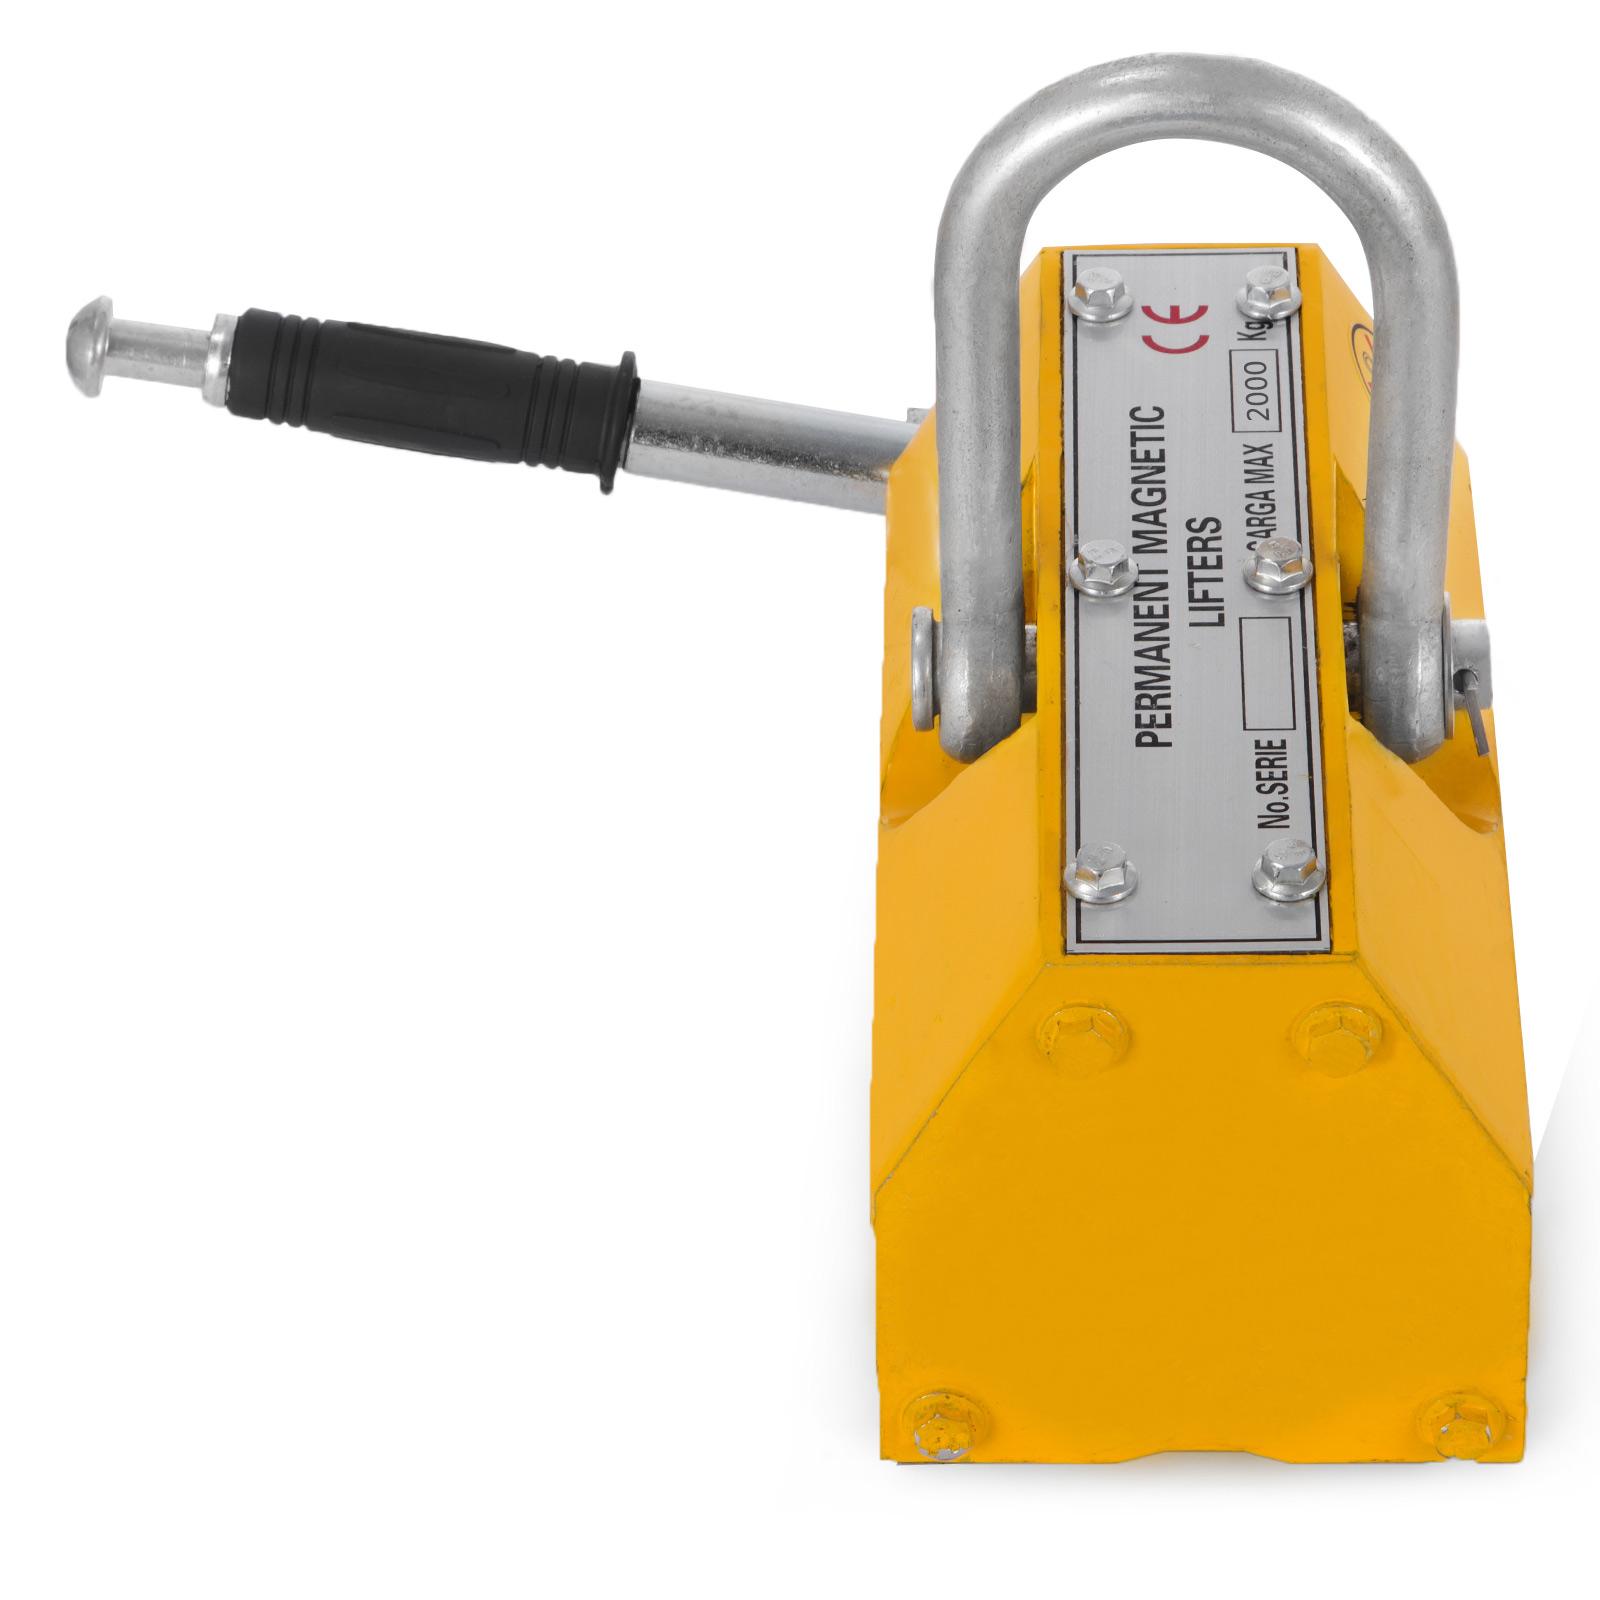 100-300-600-1000KG-Steel-Magnetic-Lifter-Heavy-Duty-Crane-Hoist-Lifting-Magnet miniature 89